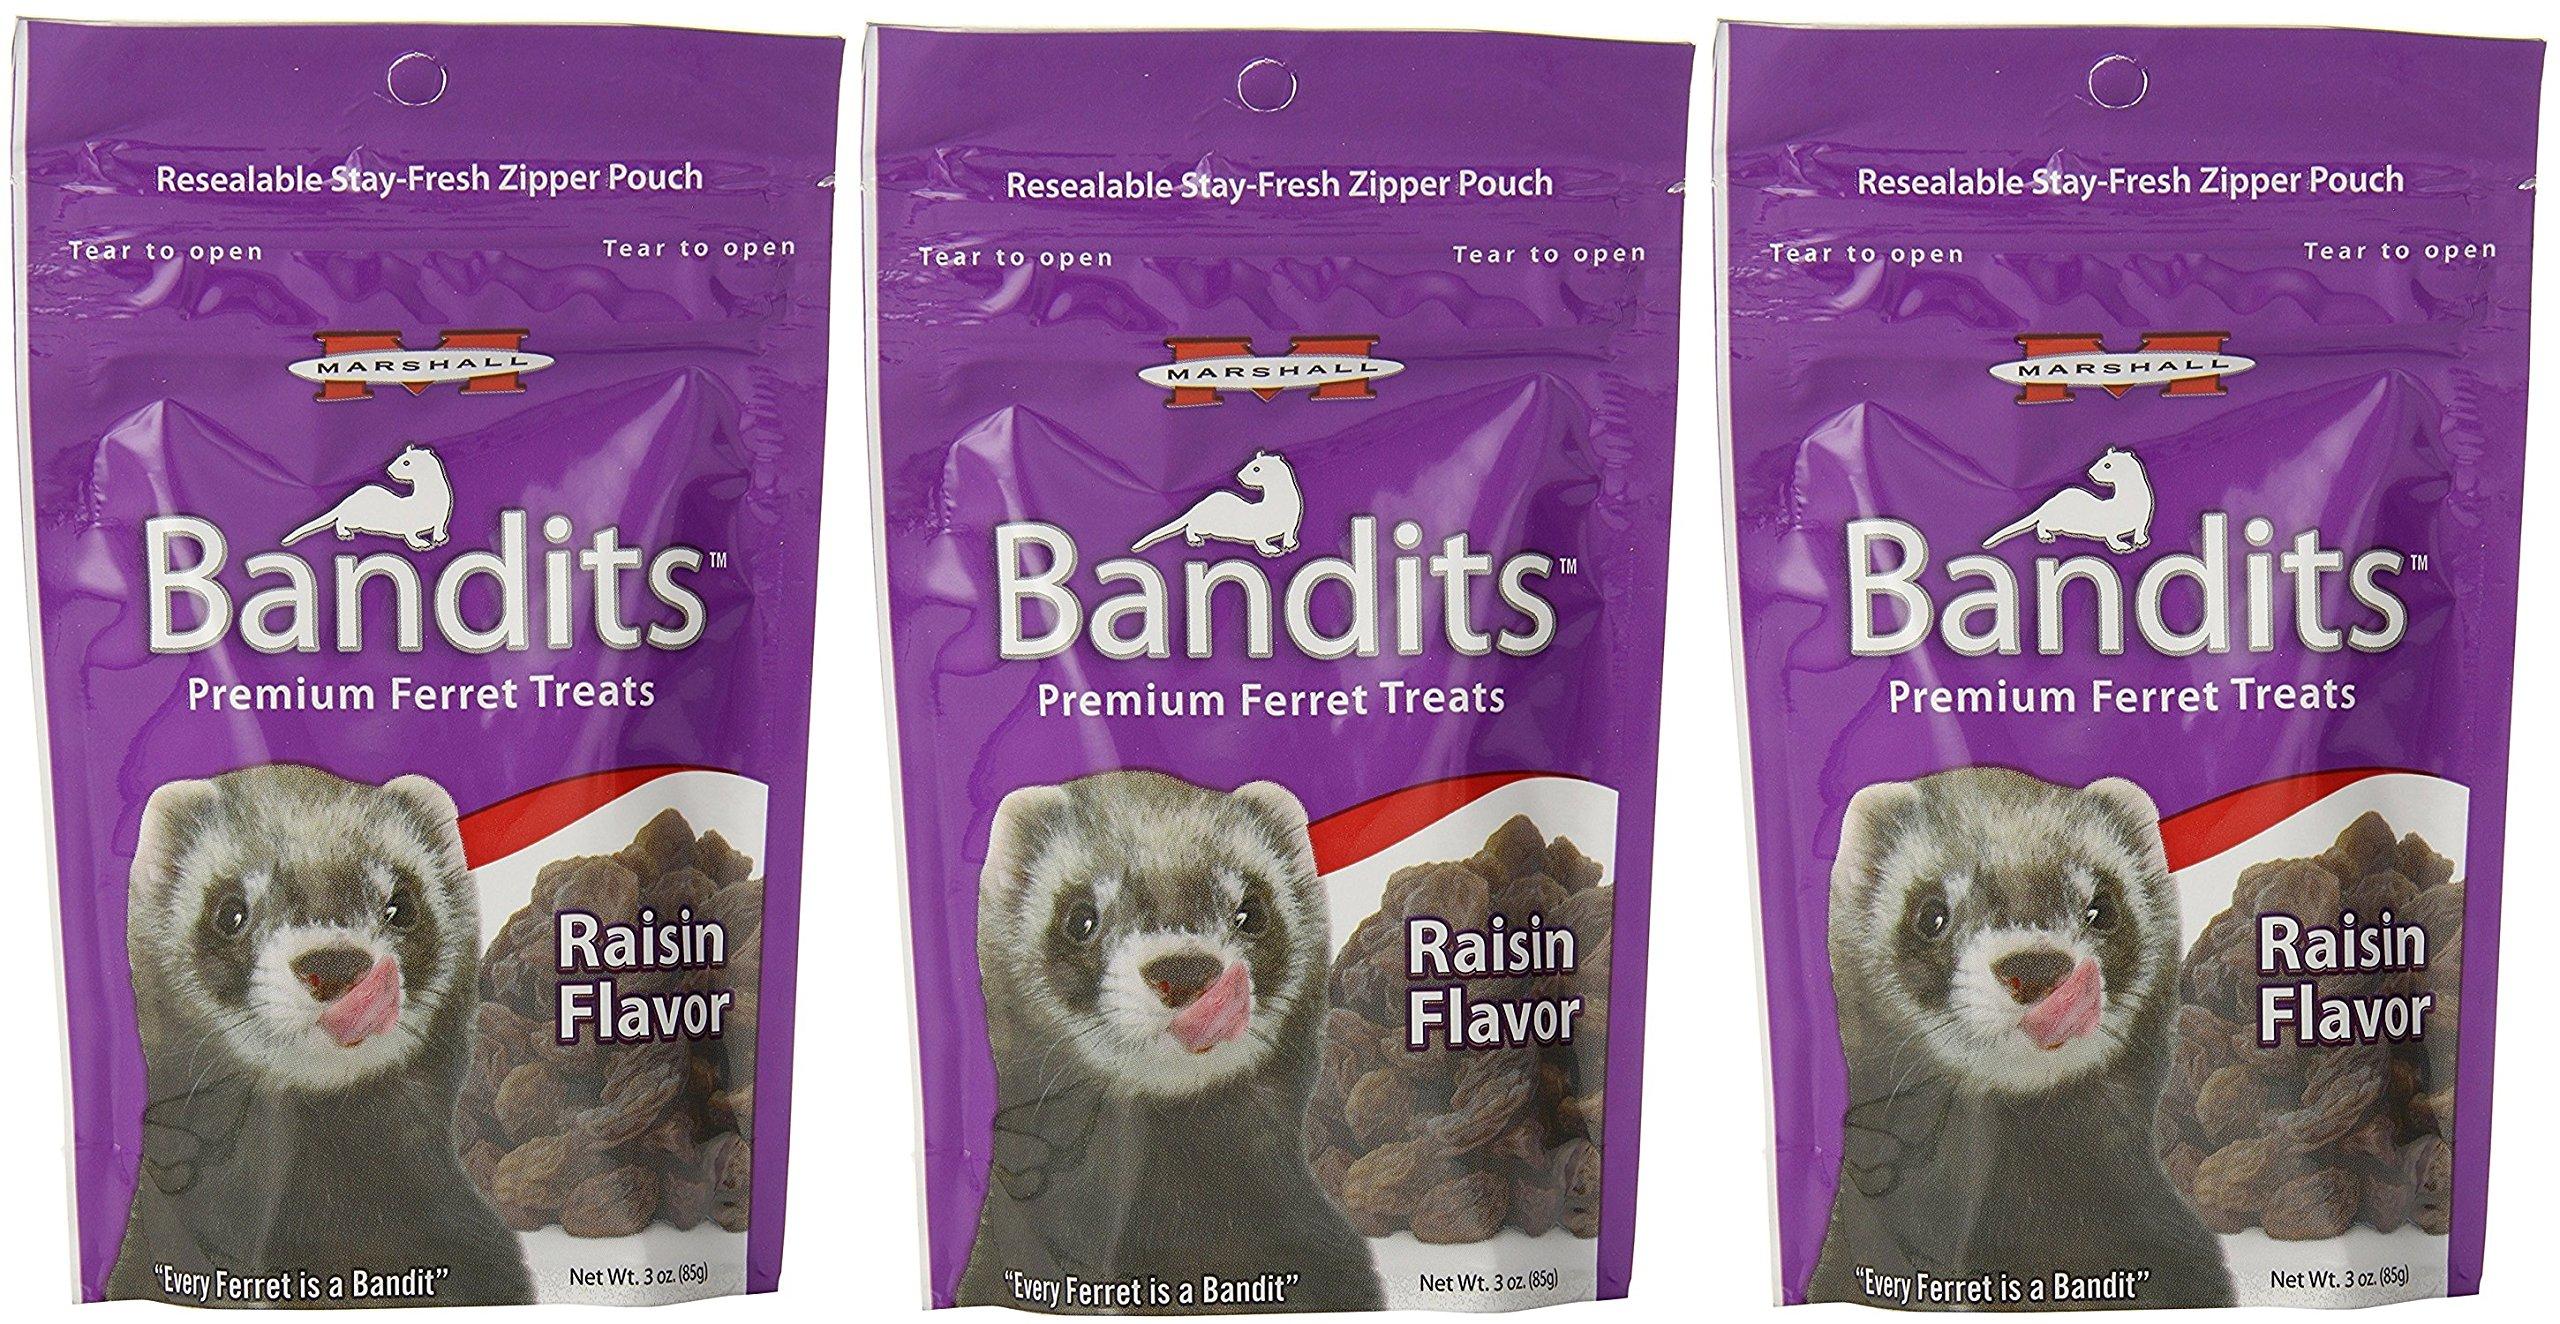 (3 Pack) Marshall Bandits Ferret Treat, 3-Ounce, Raisin